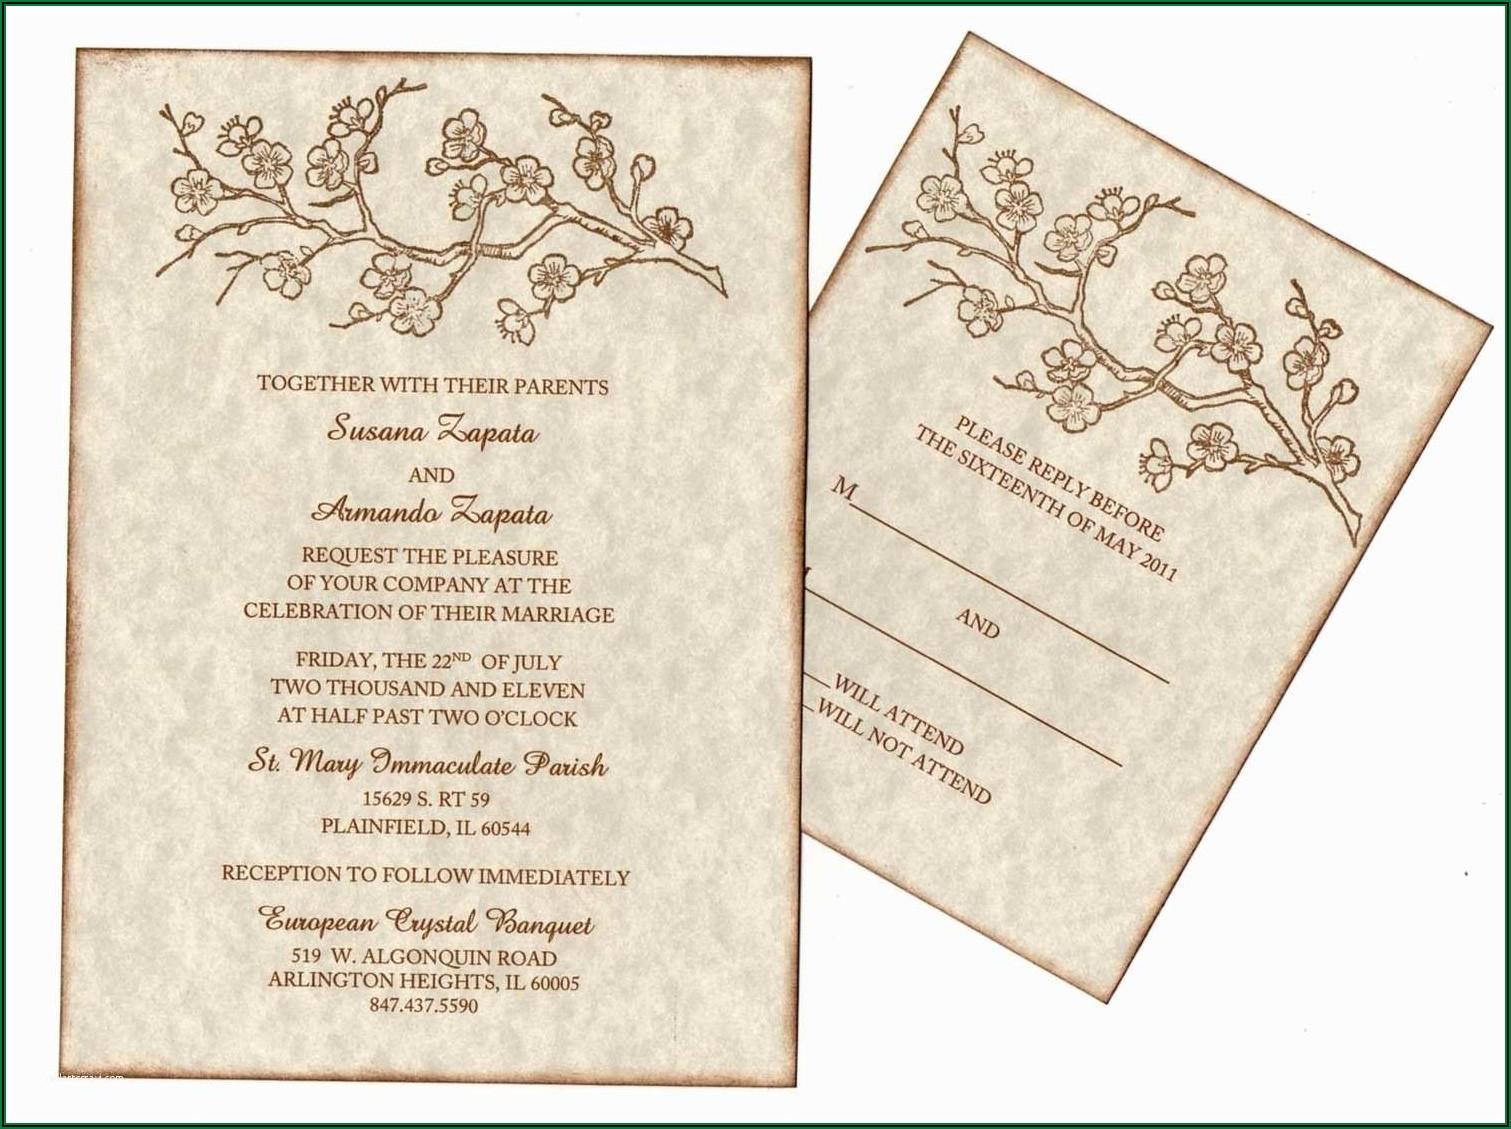 Wedding Invitation For Indian Wedding Hindu Wedding Invitation Samples Various Invitation Card